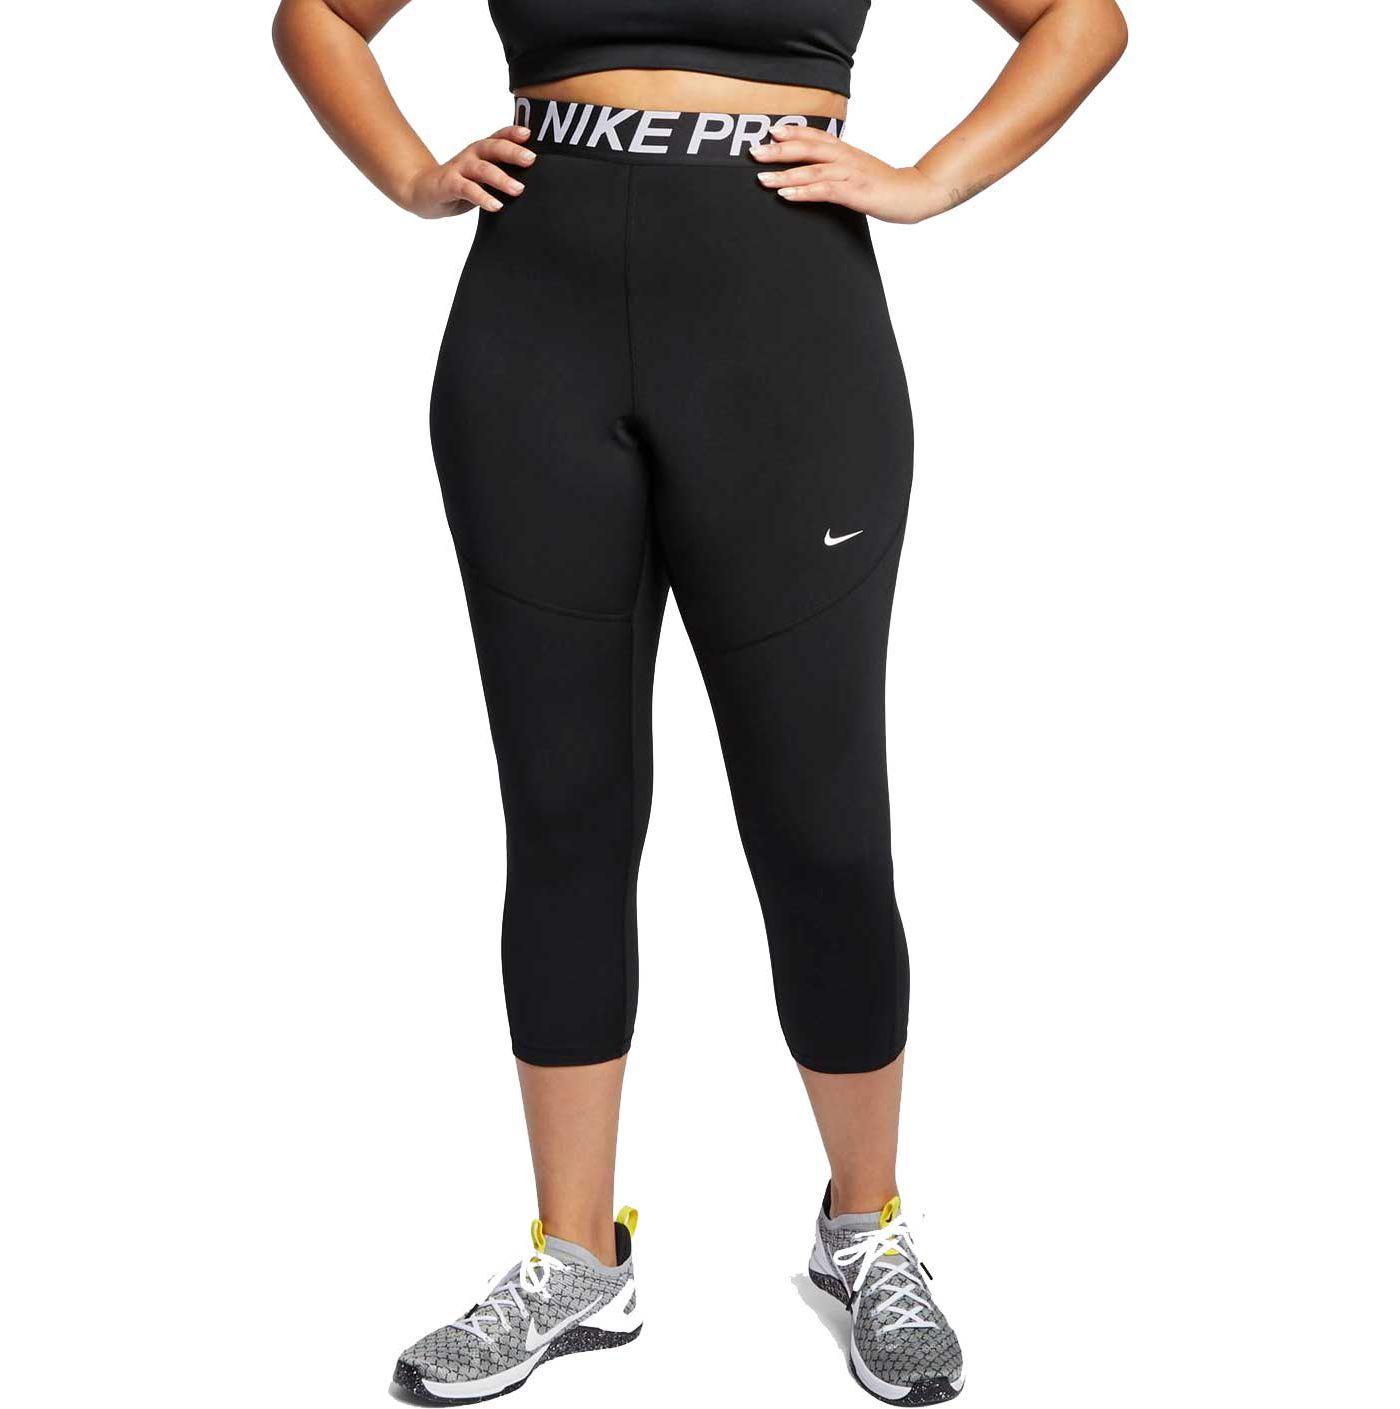 Nike Women's Plus Size Pro Crop Tights